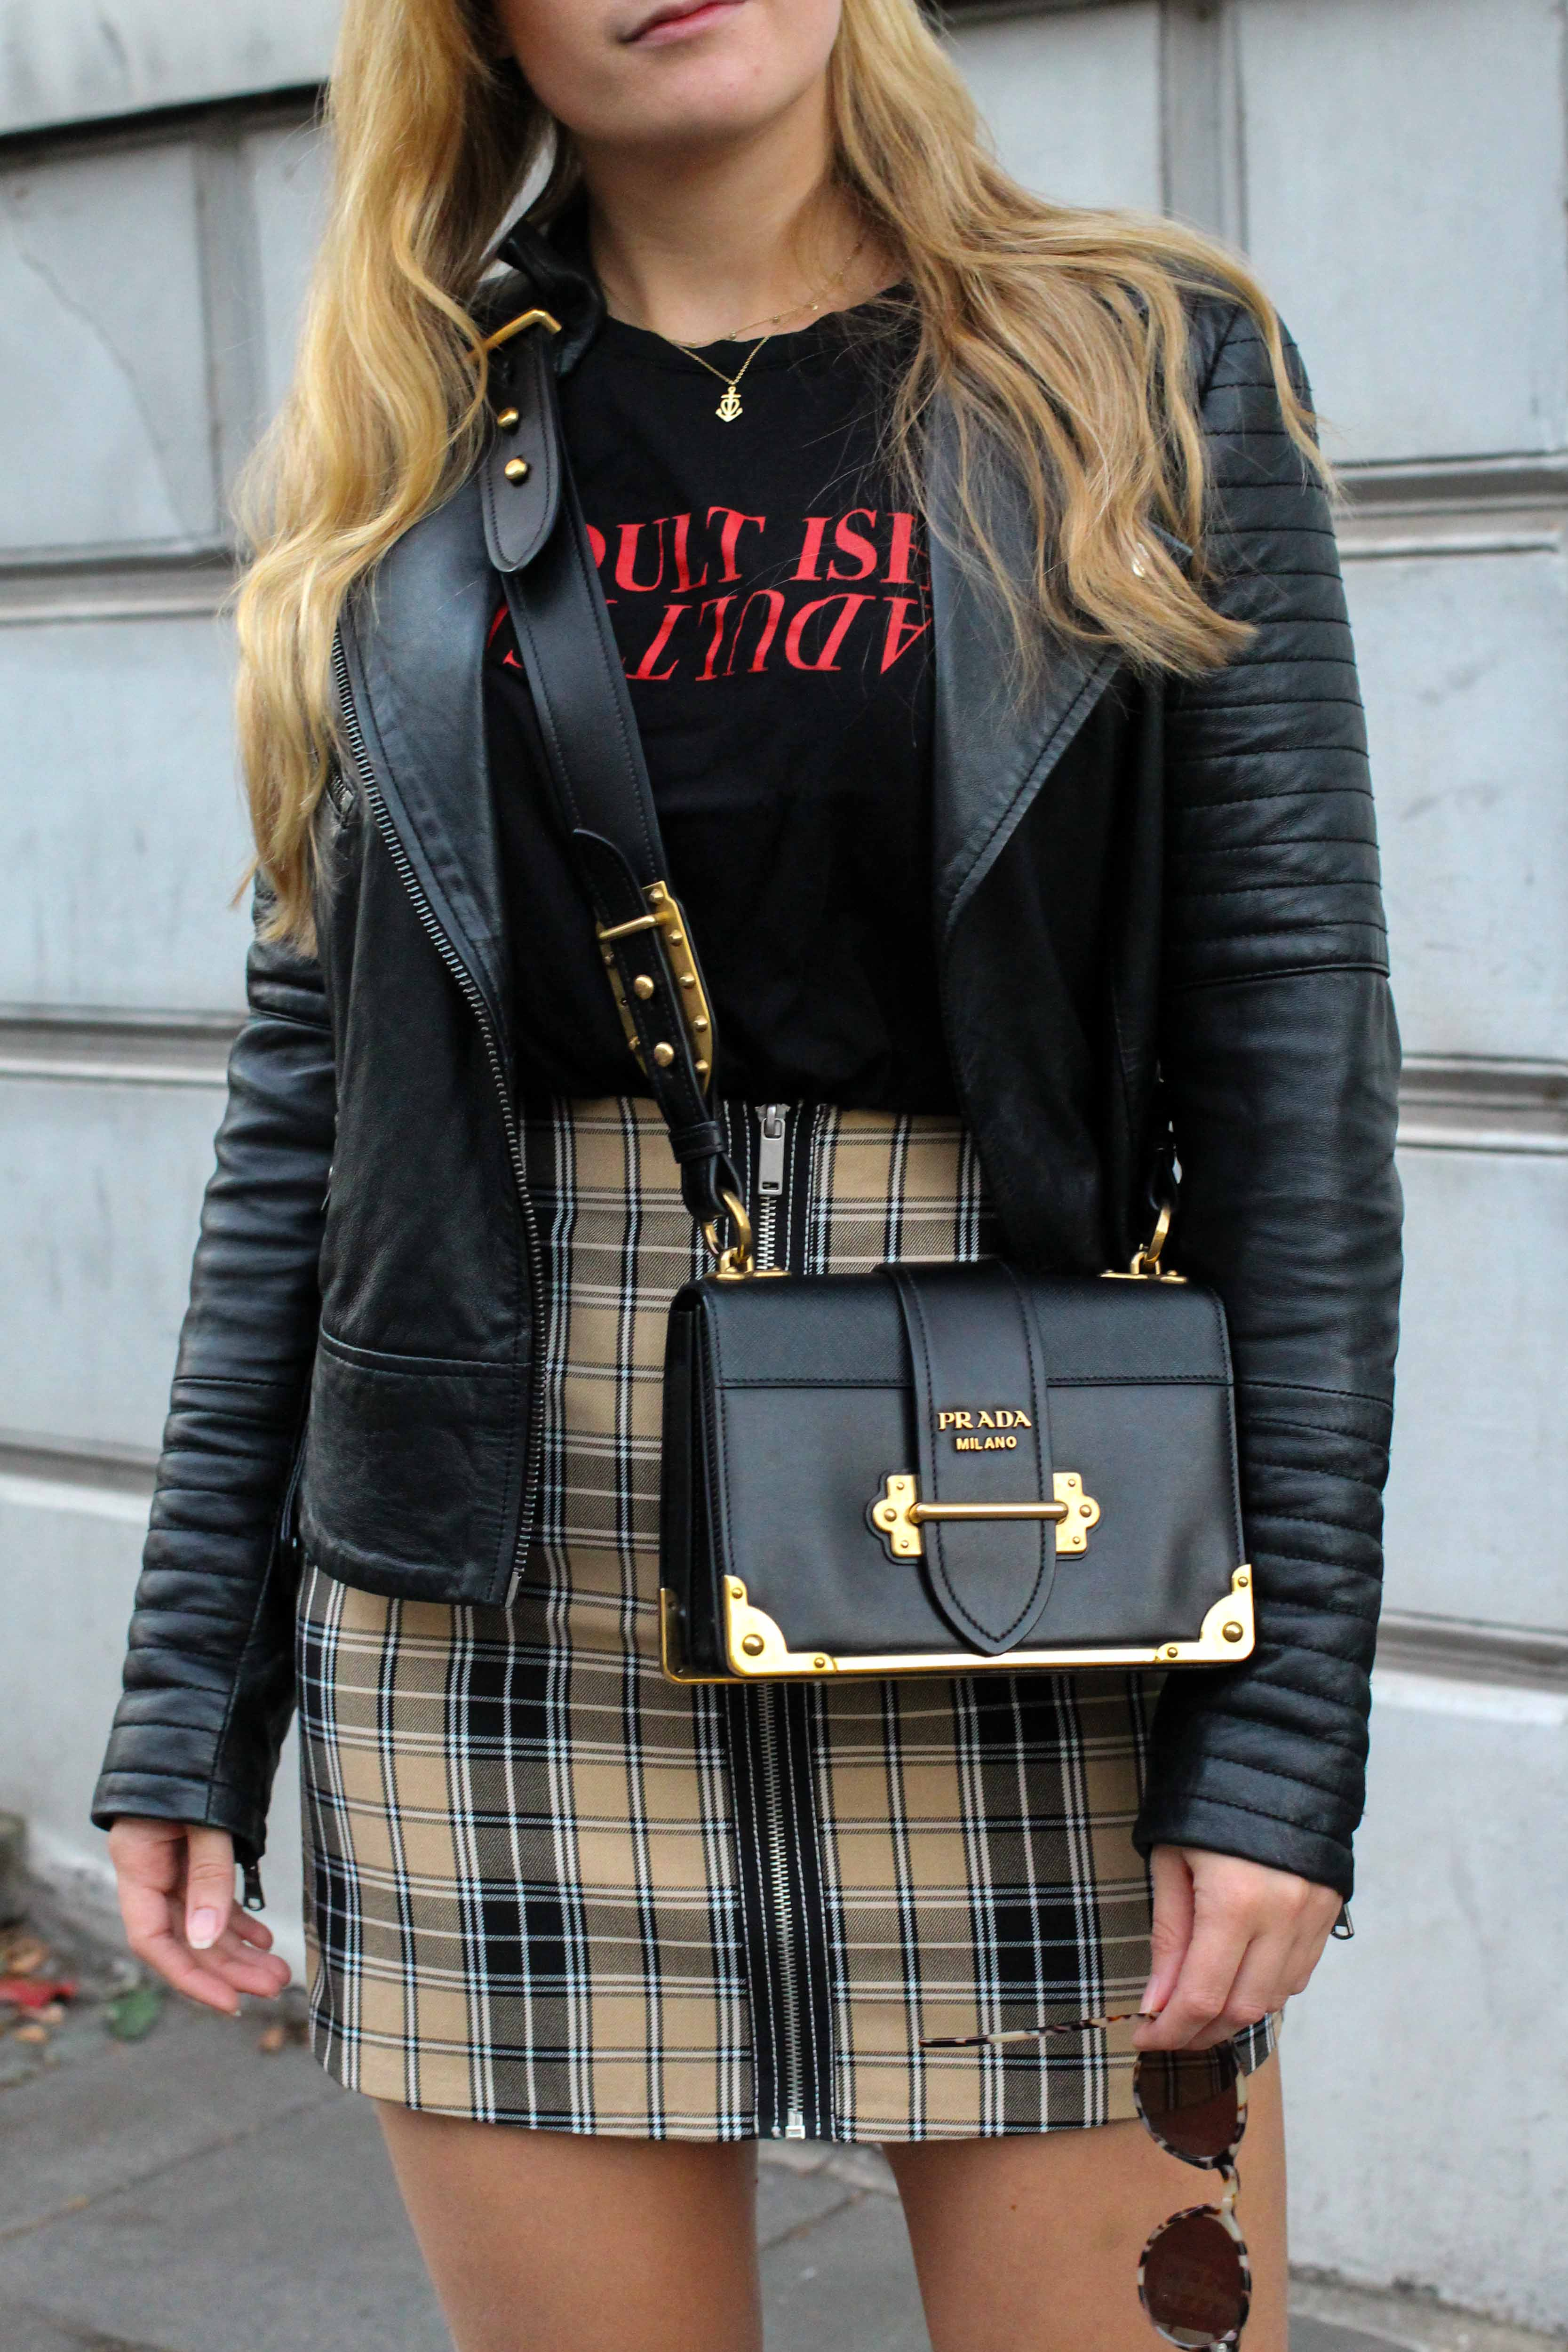 Outfit Karorock kombinieren Lederjacke Details Statement Shirt Adultish Übergangslook Modeblog Prada Cahier Tasche schwarz Bonn 5